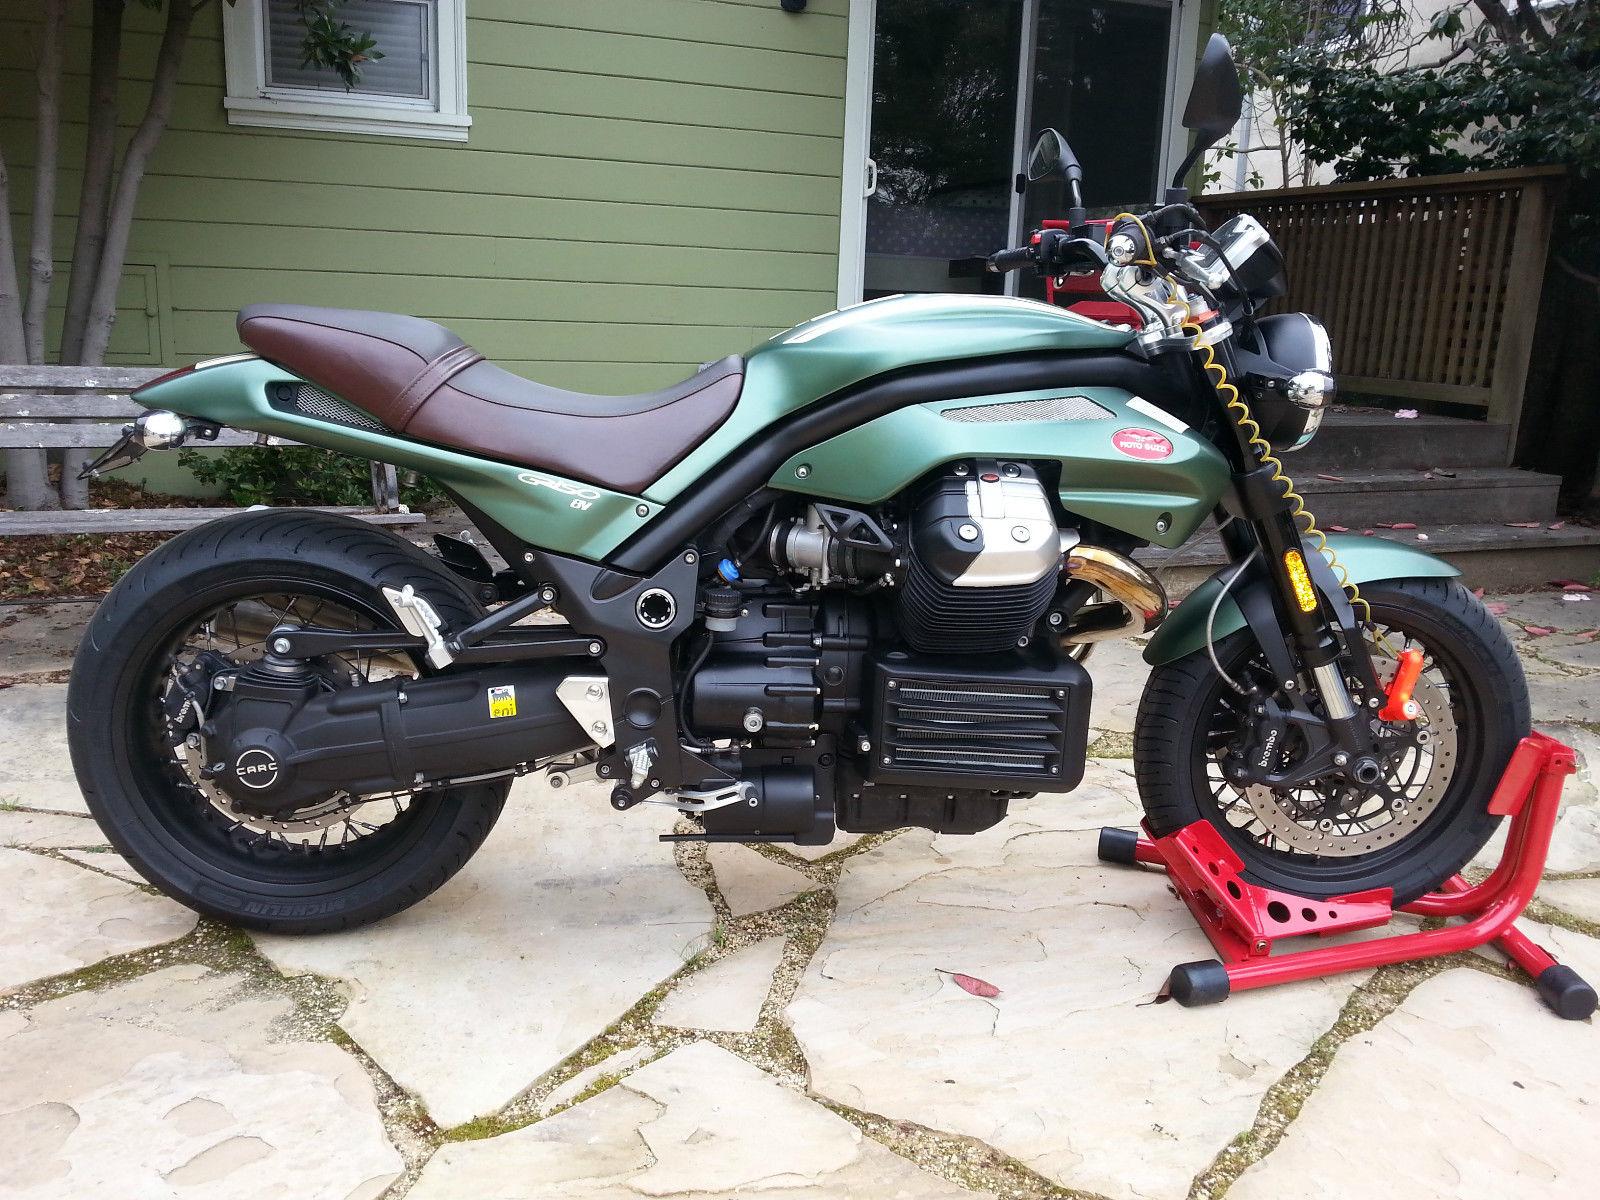 tenni green 2012 moto guzzi griso se bike urious. Black Bedroom Furniture Sets. Home Design Ideas